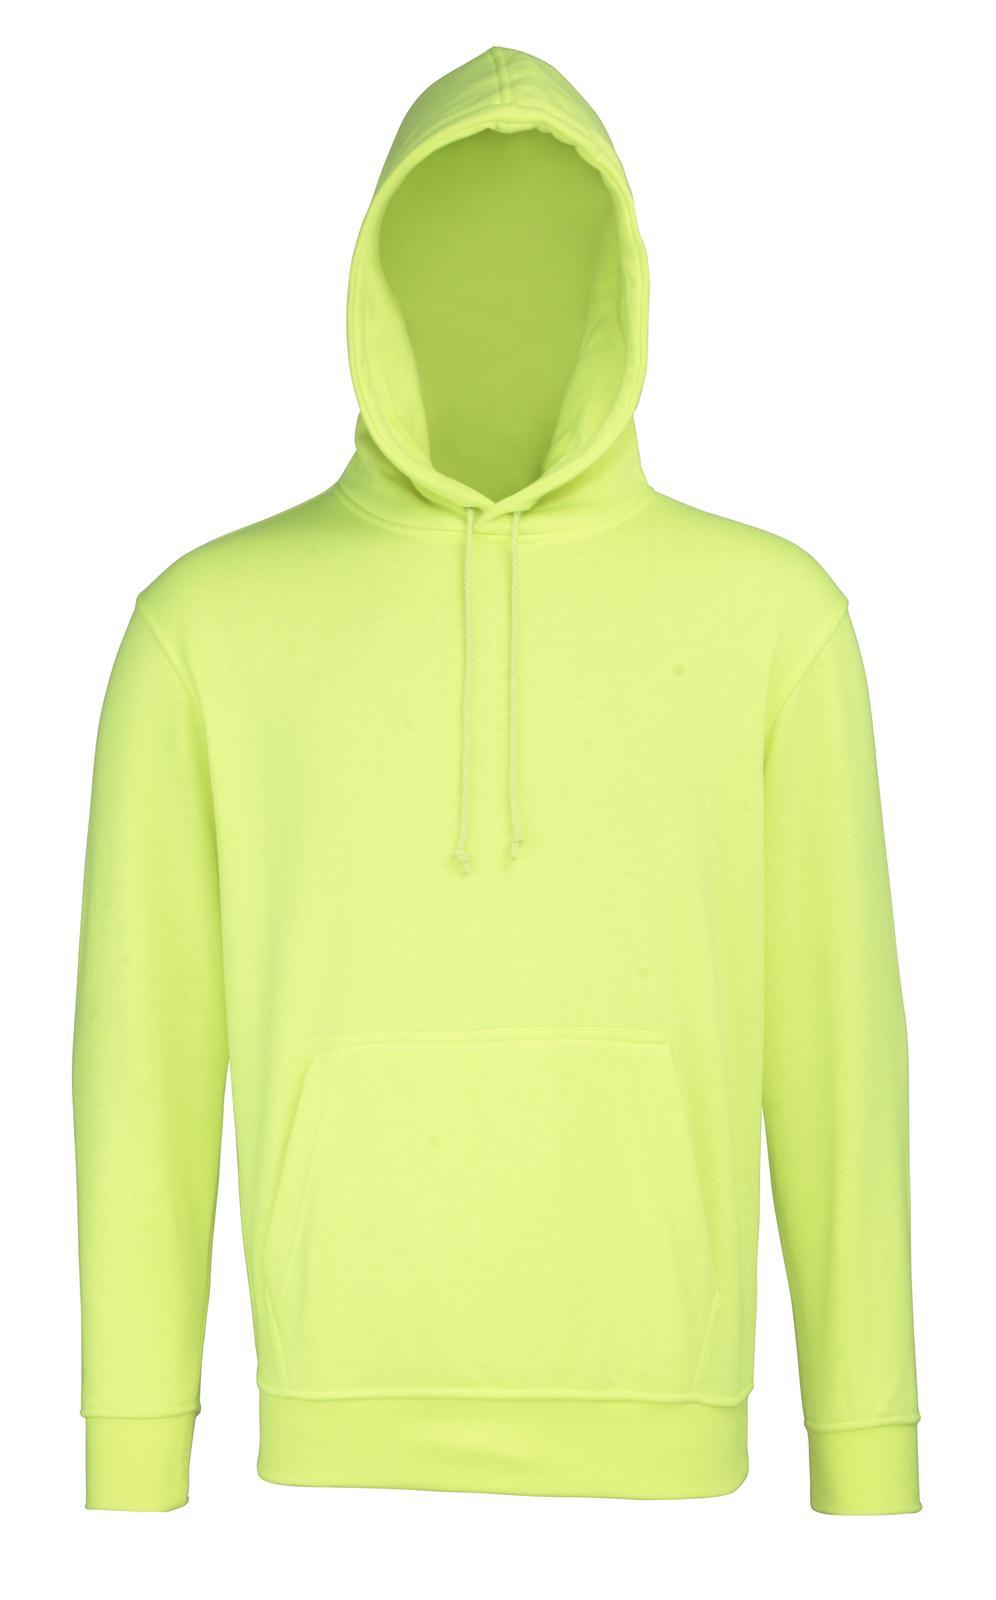 New RTY Mens Work Safety Hi Viz Hoodie Sweatshirt in Bright Yellow